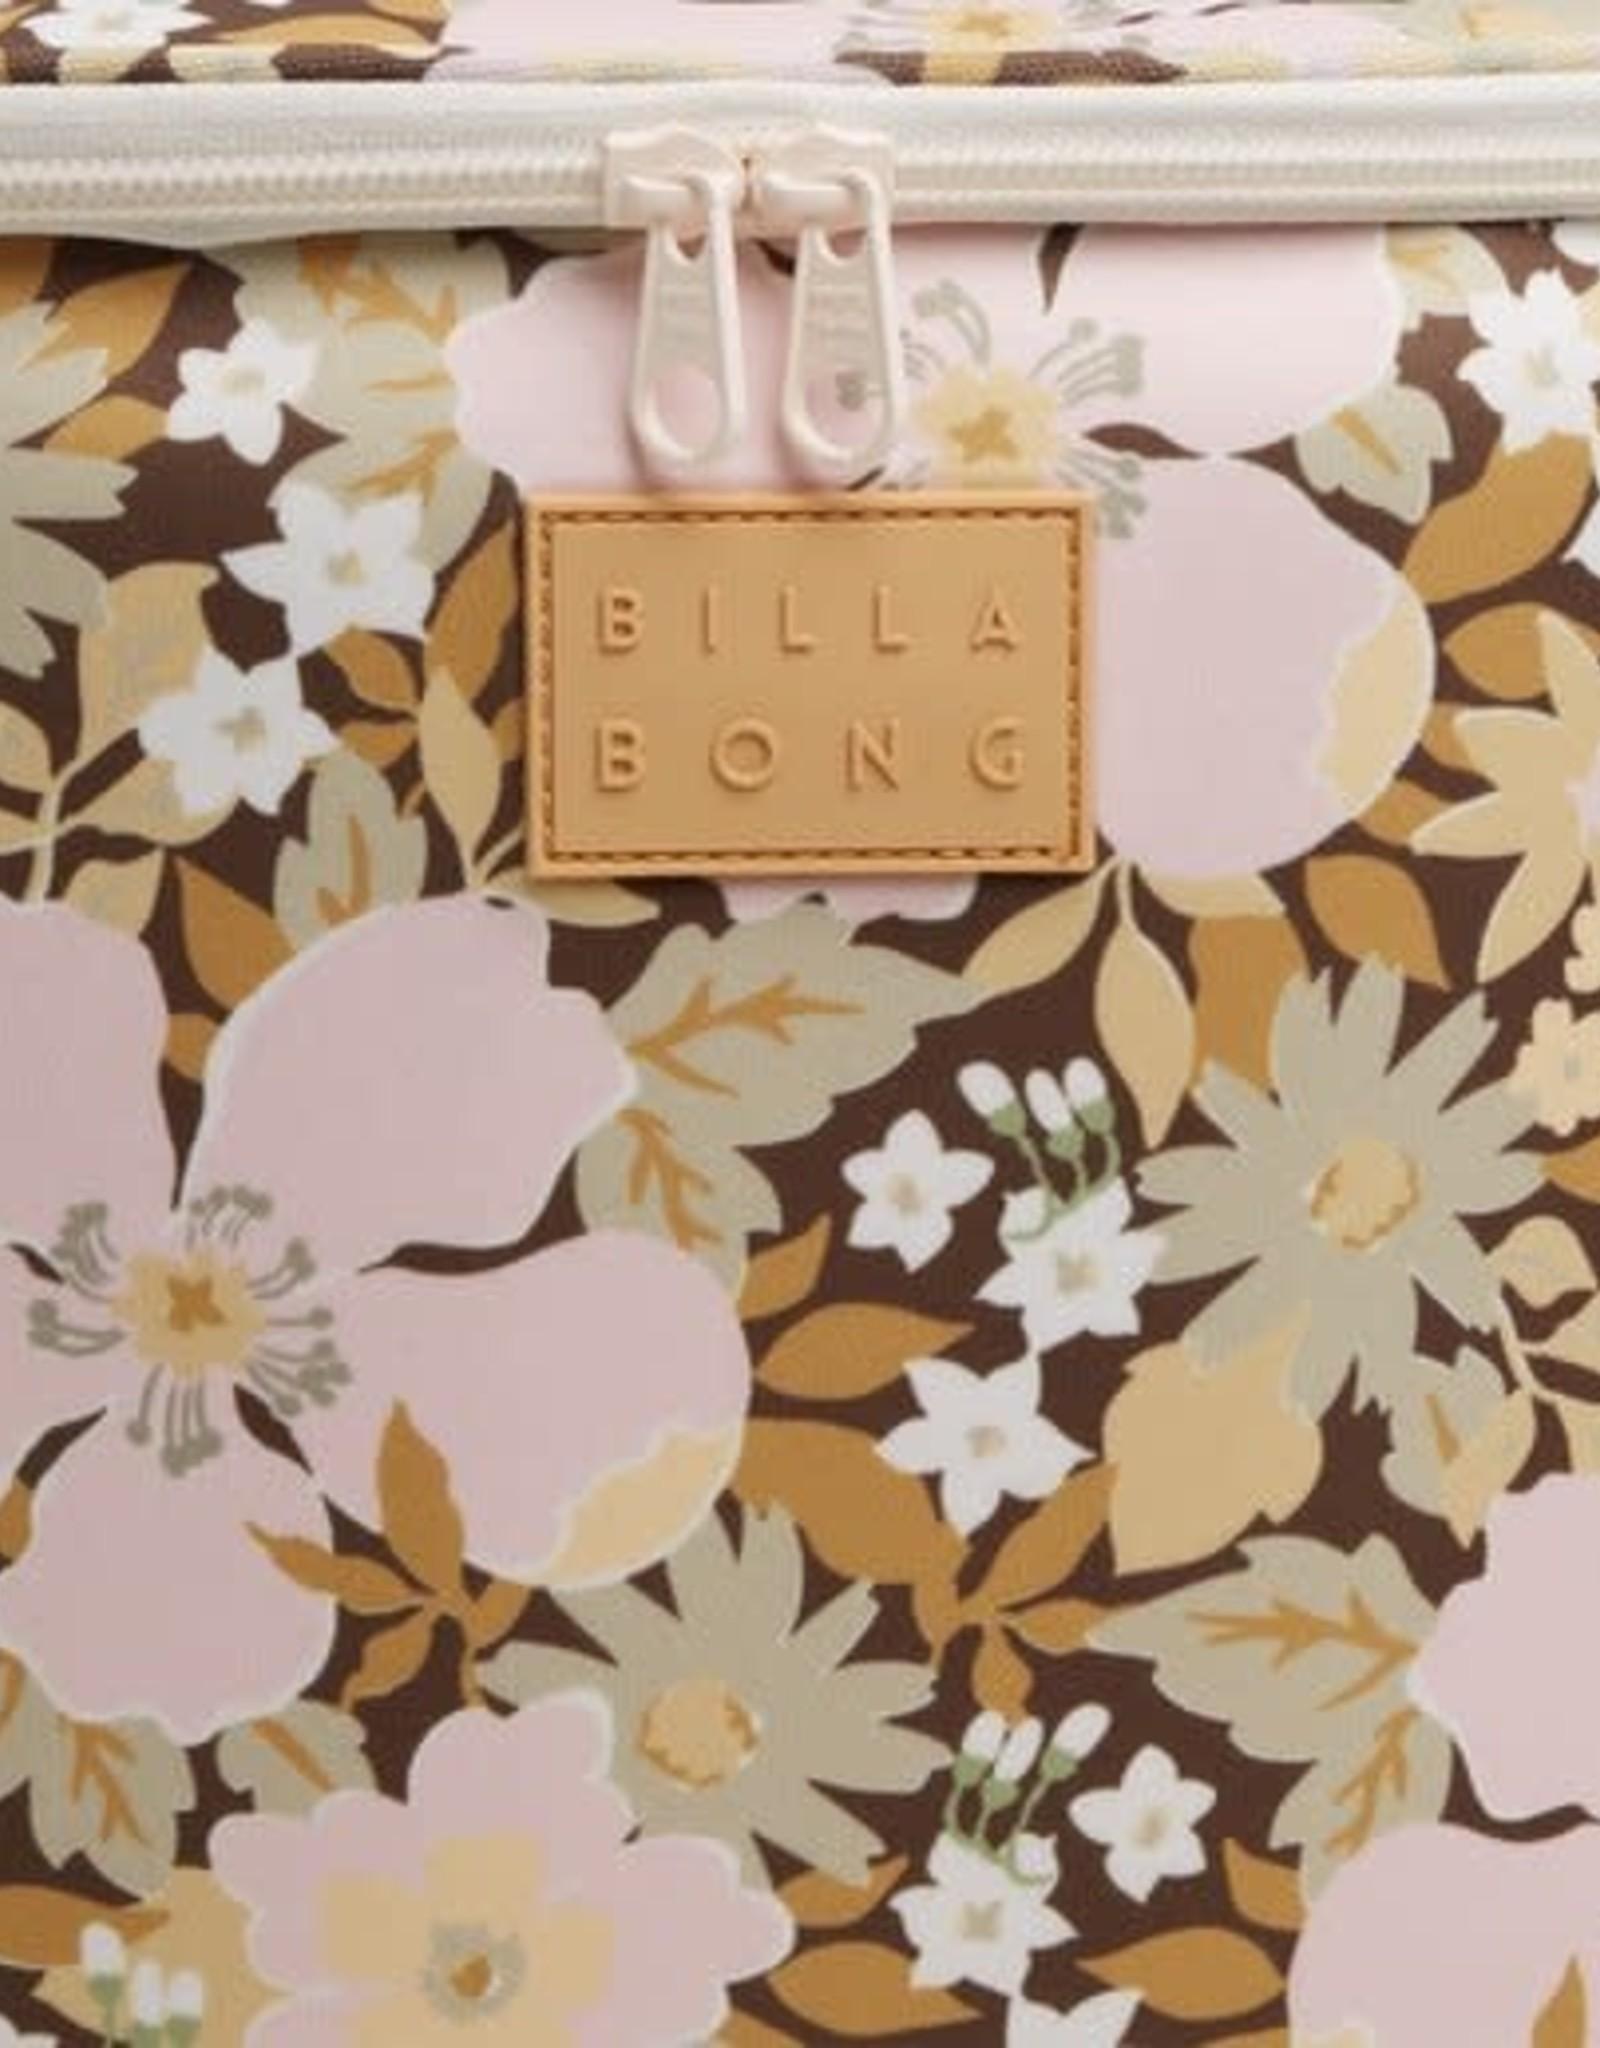 BILLABONG Sweet Dreams Cooler Bag